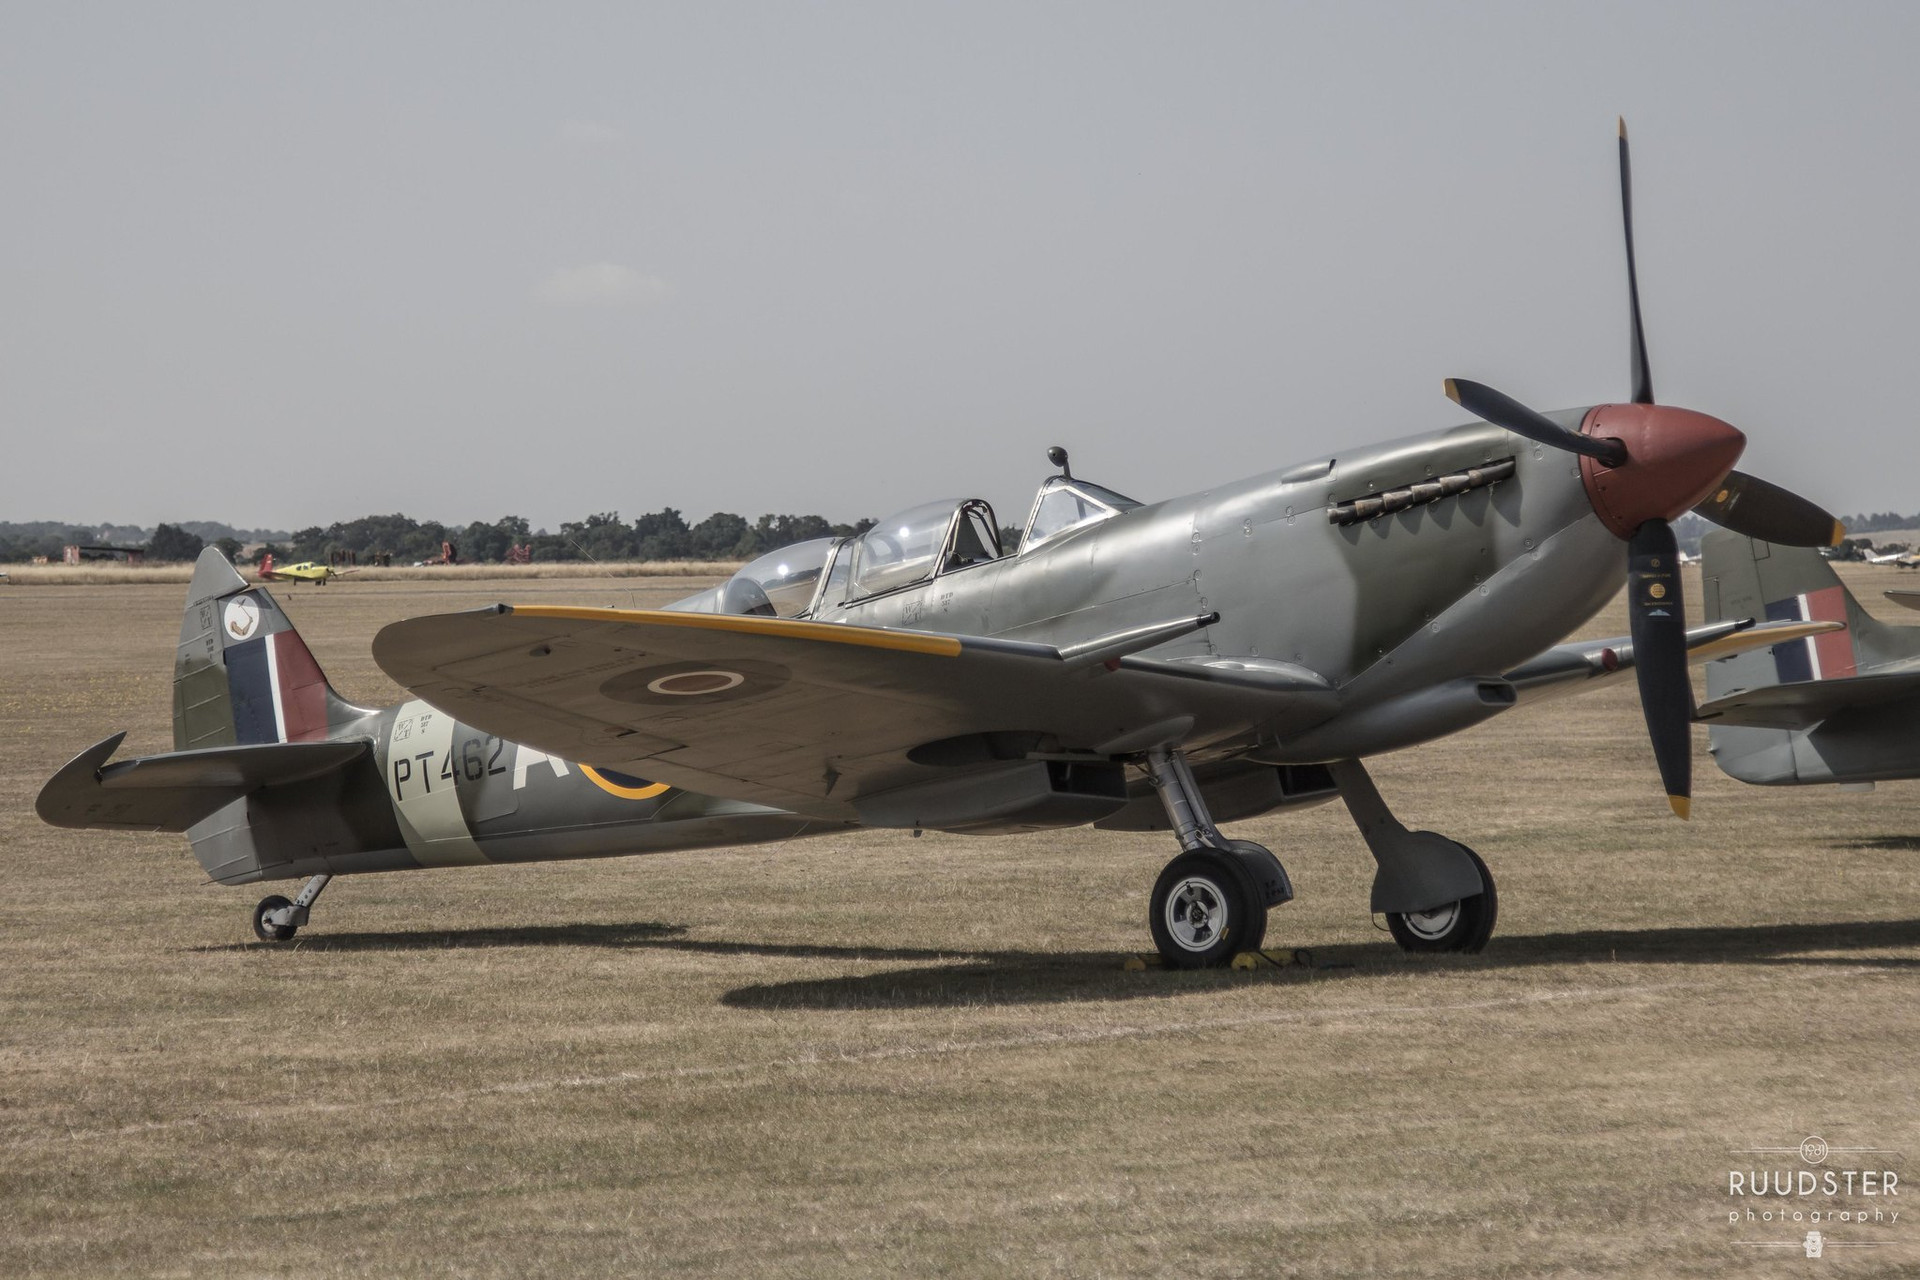 PT462   Build: 1943 - Supermarine Spitfire Mk.H.F.IXe